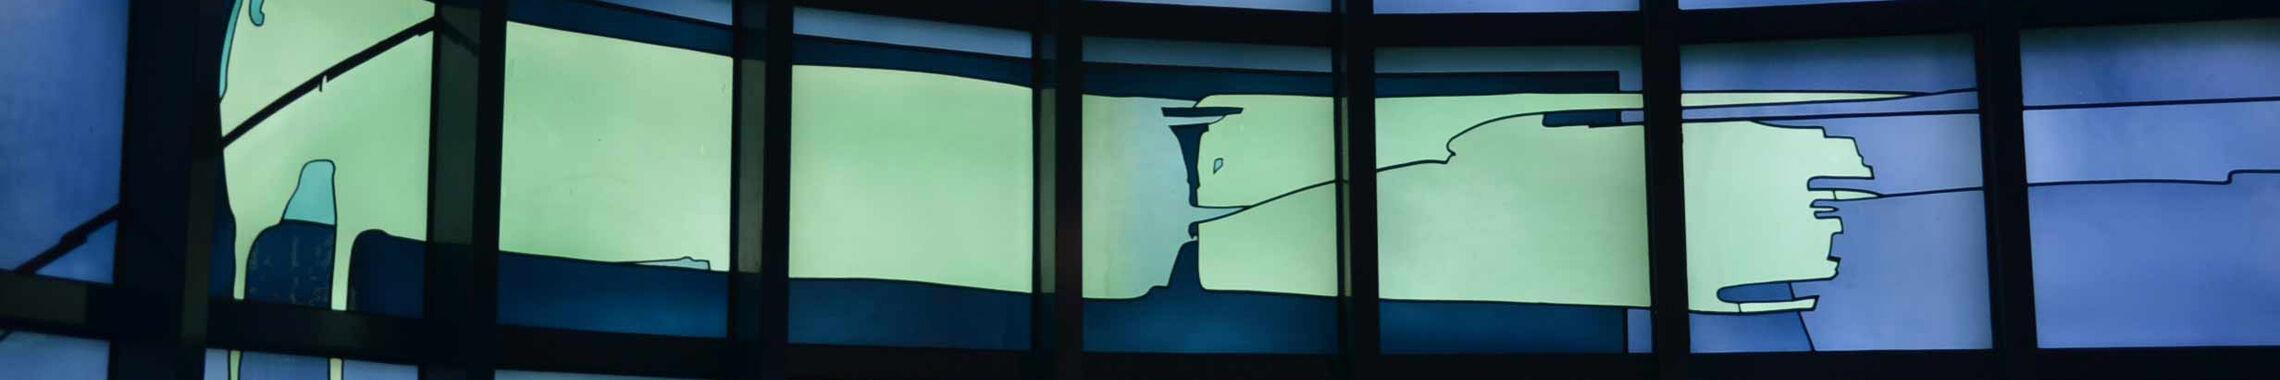 kopf_glasfenster_blau